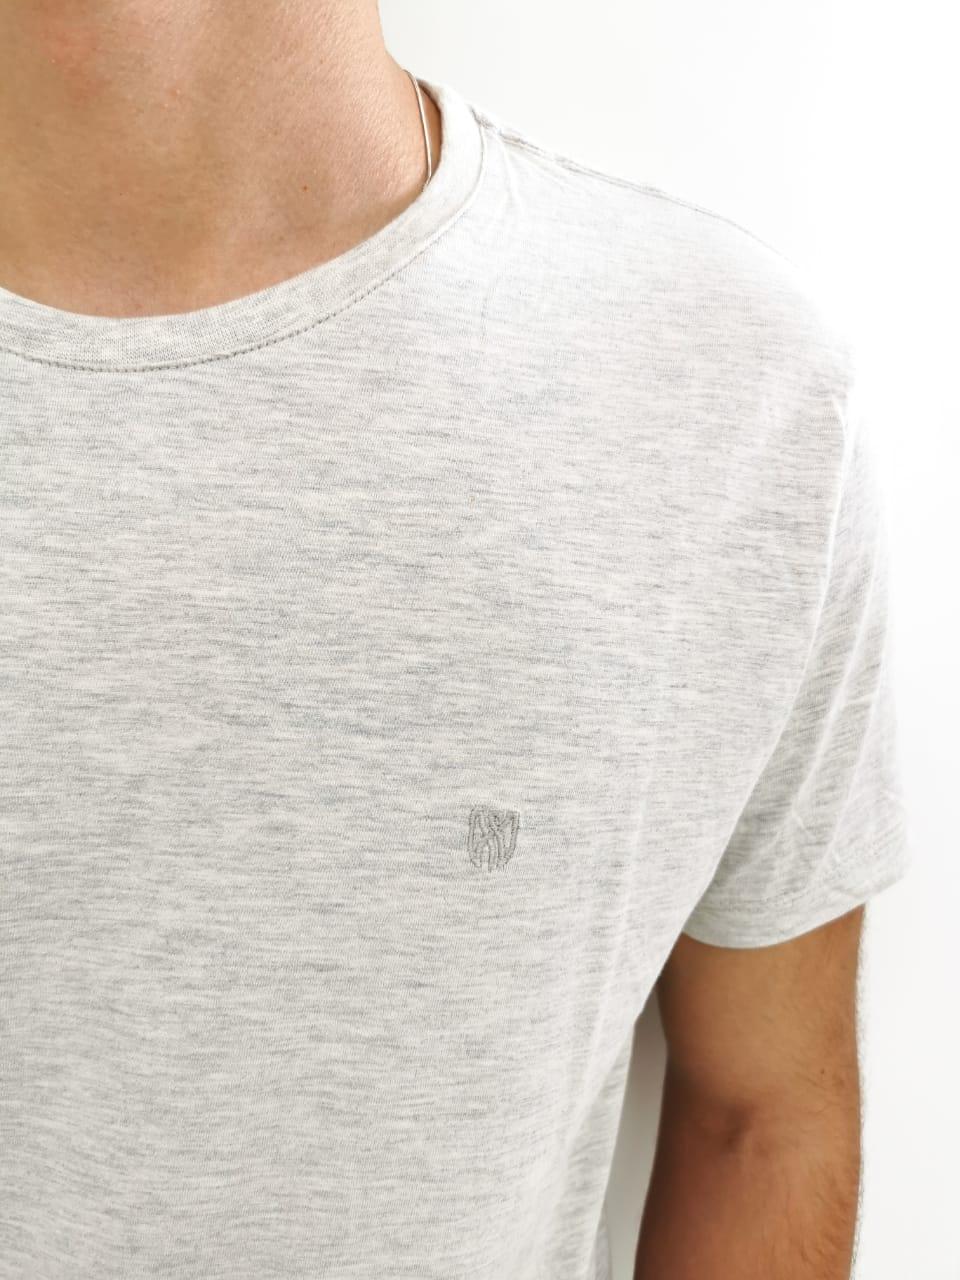 Camiseta Básica Lozemar Bege Mescla